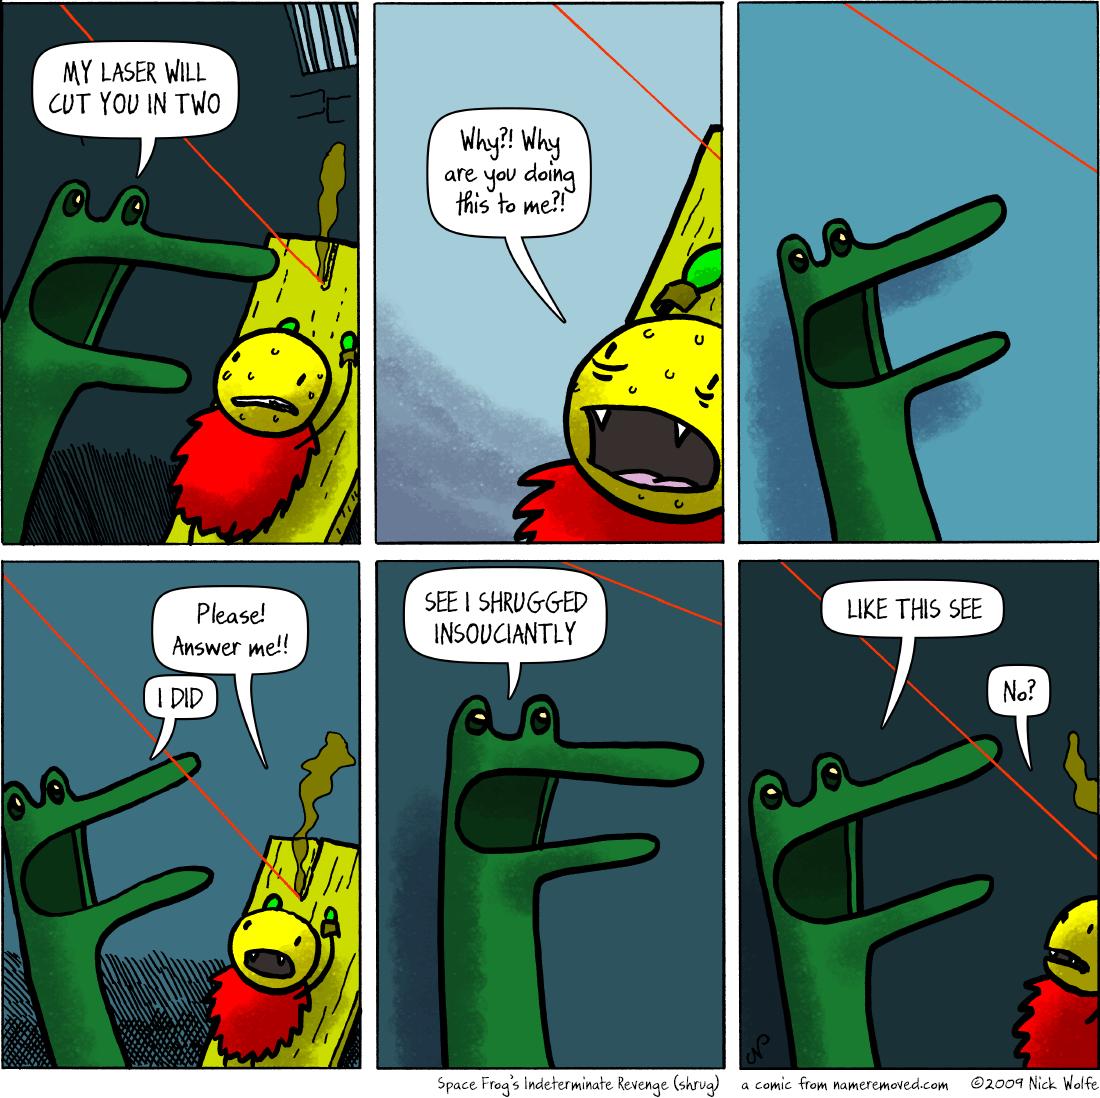 Space Frog's Indeterminate Revenge (shrug)